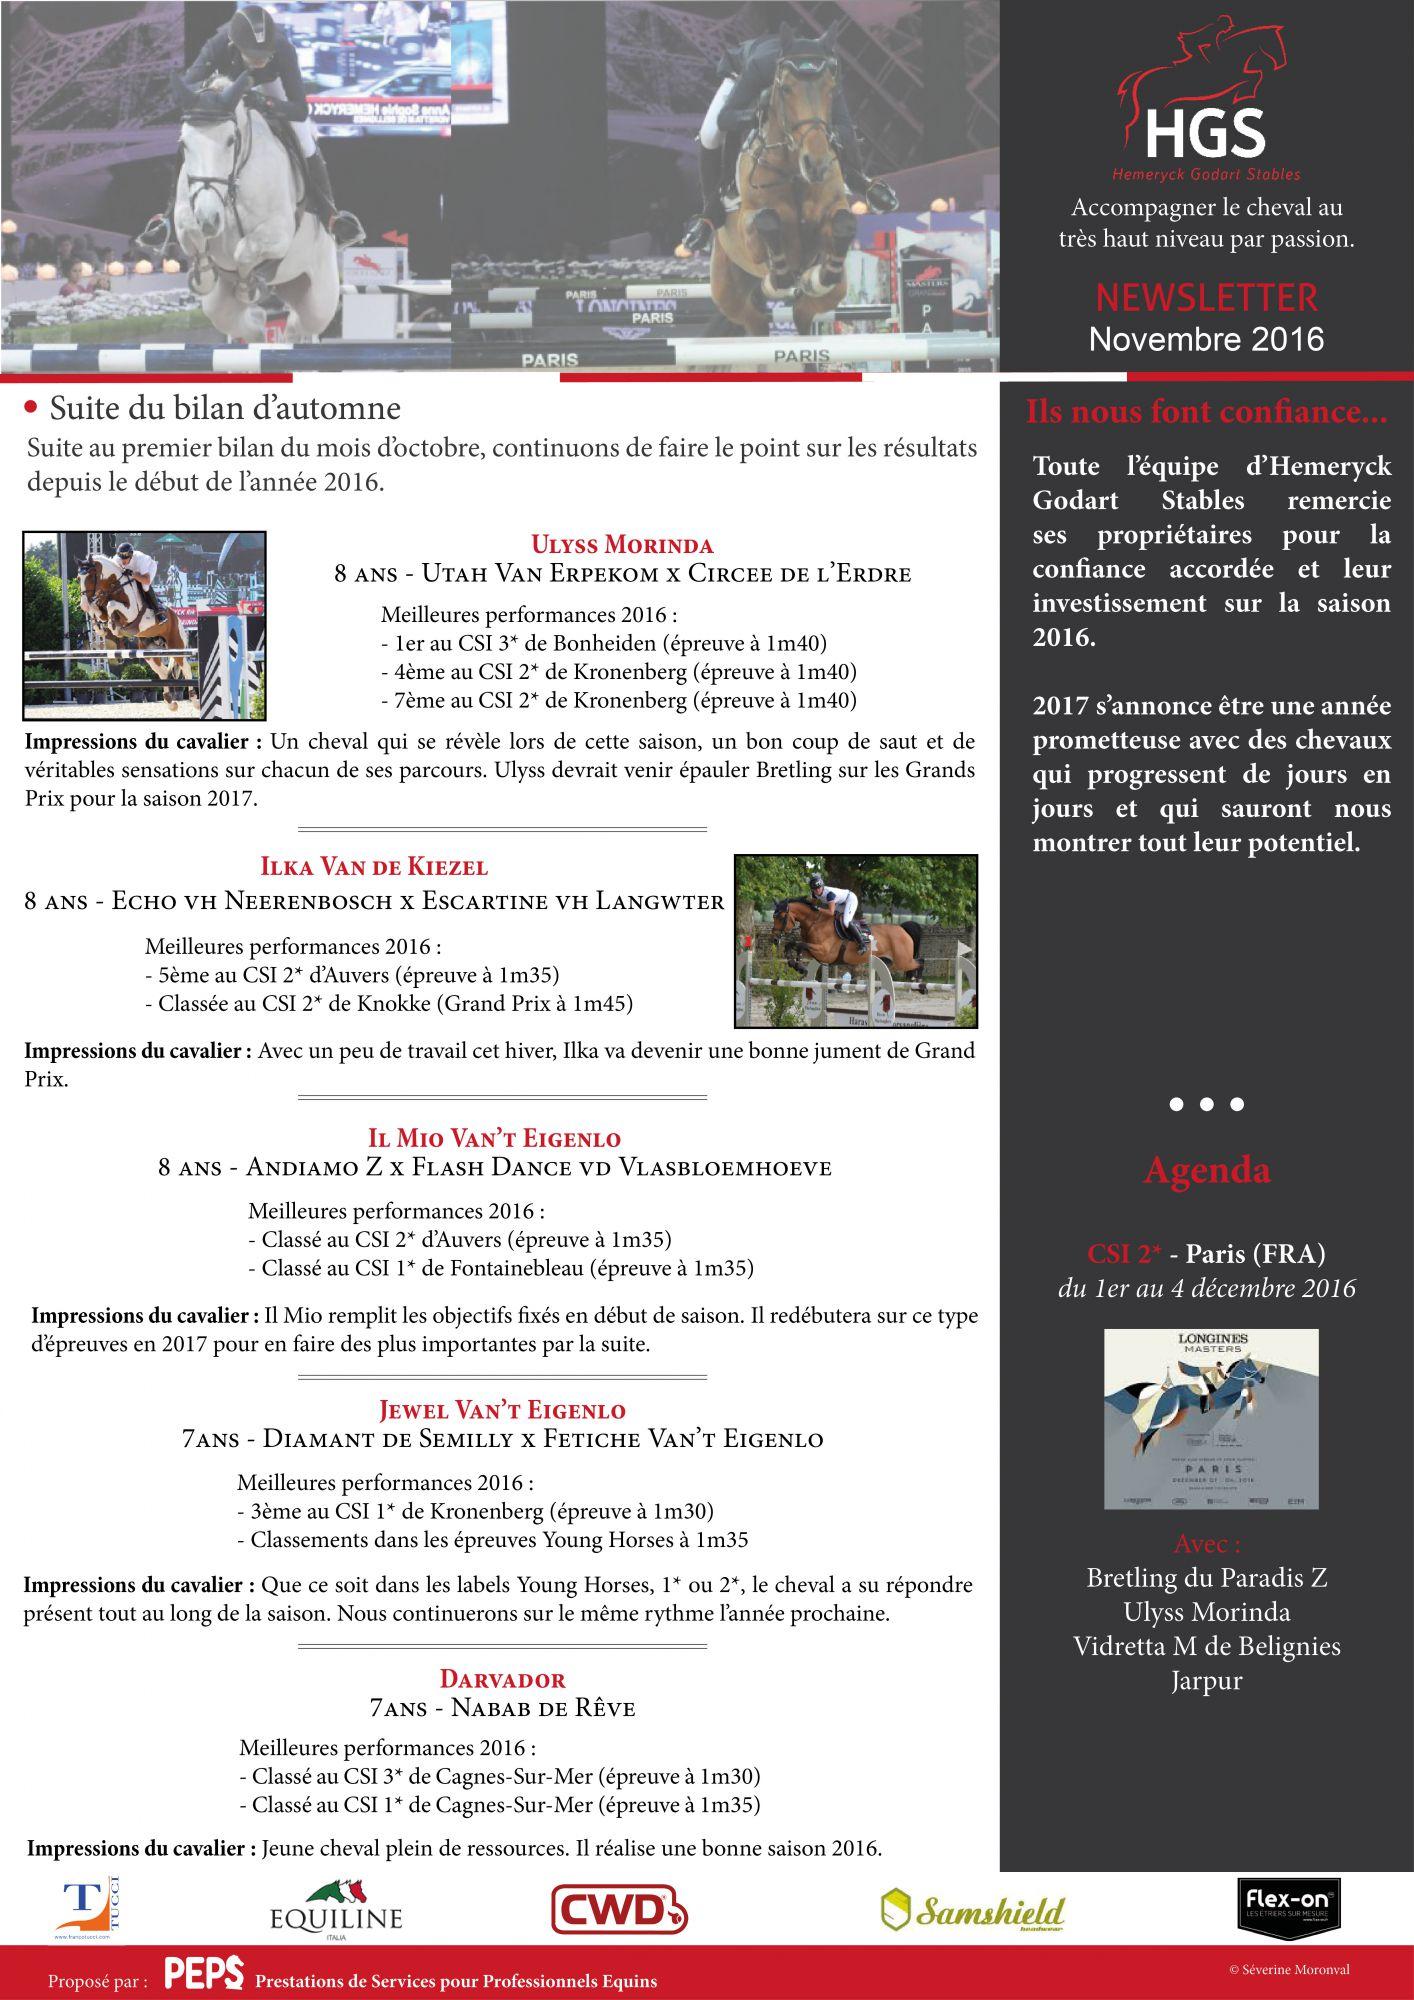 hgs-nl-novembre-2016-2